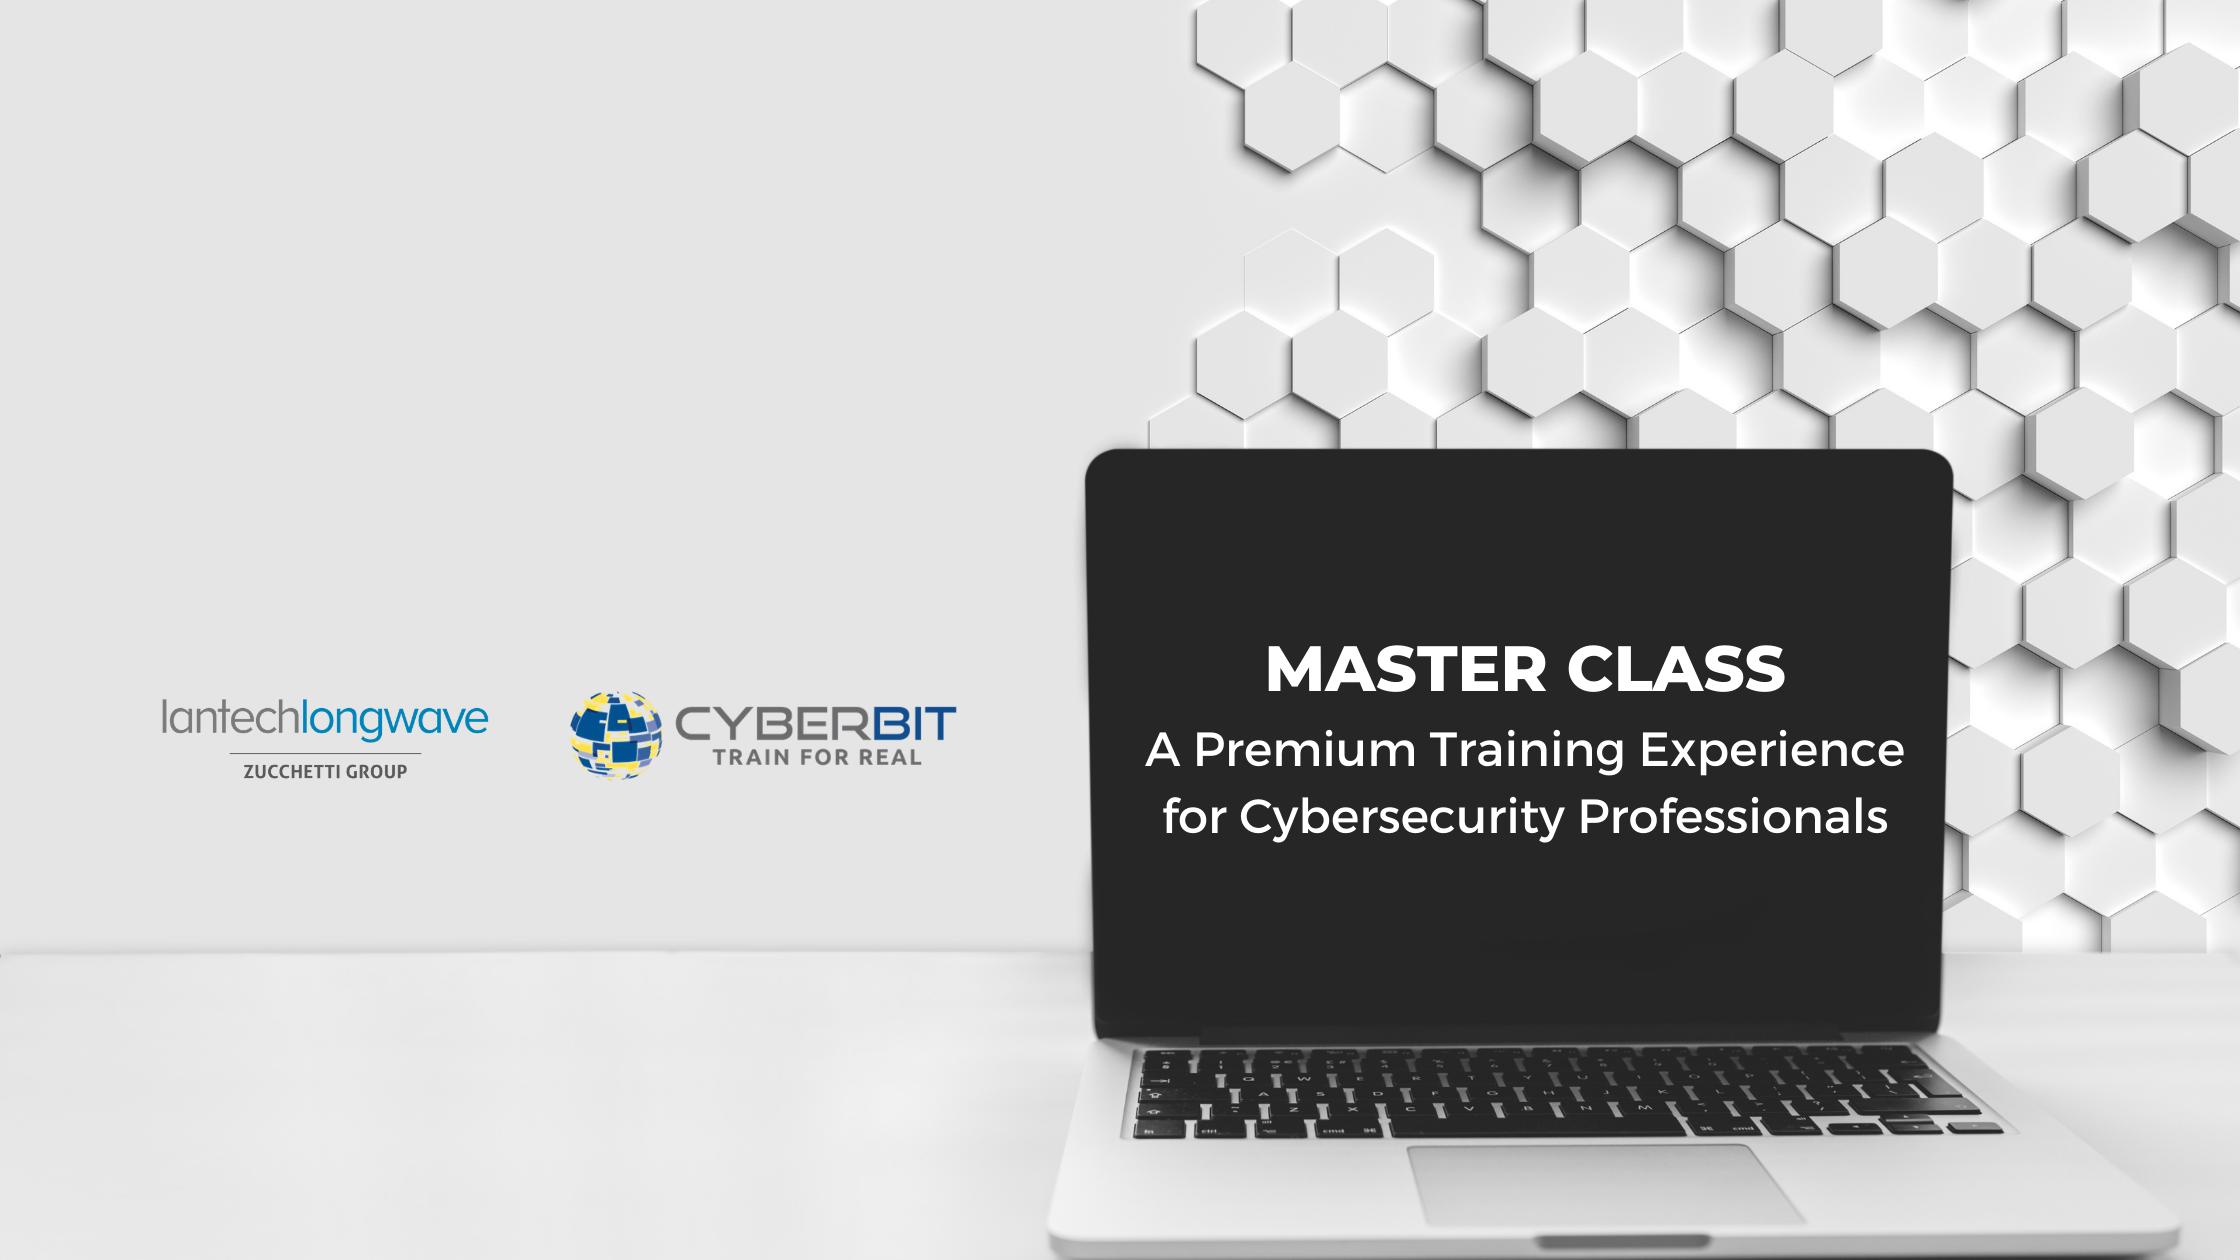 25 marzo: Cyberbit Master Class Second Edition